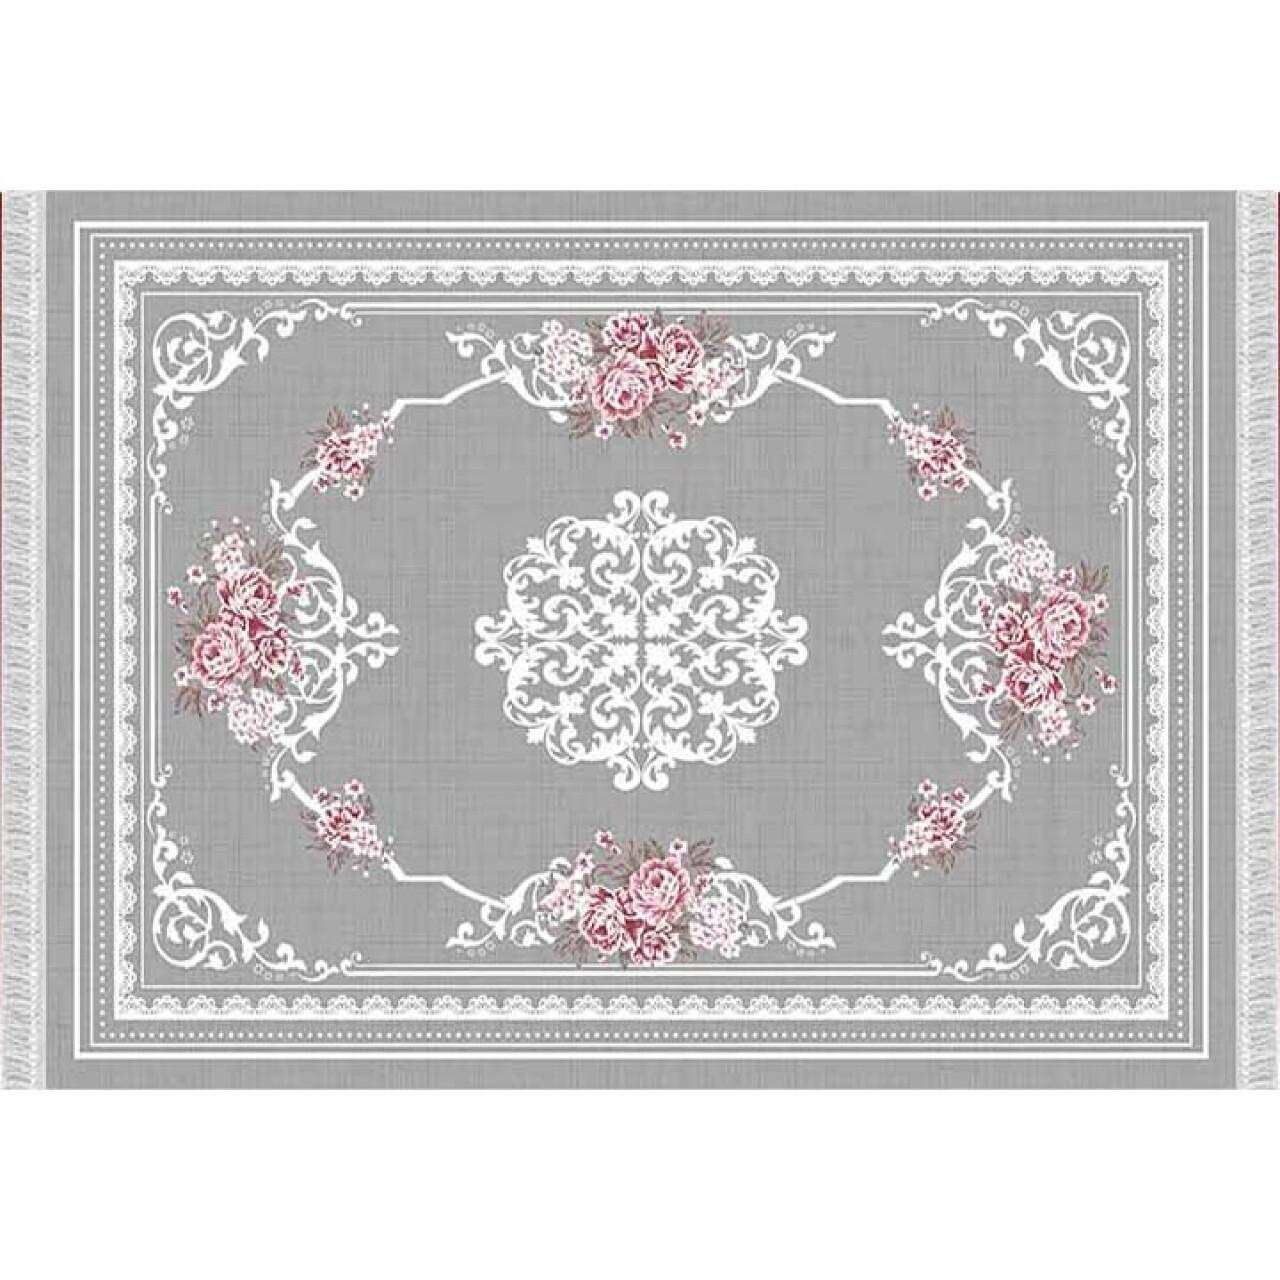 Covor Delicate, Sedef Koberec 904, 80 x 150 cm, 100% poliester, gri/alb/rosu